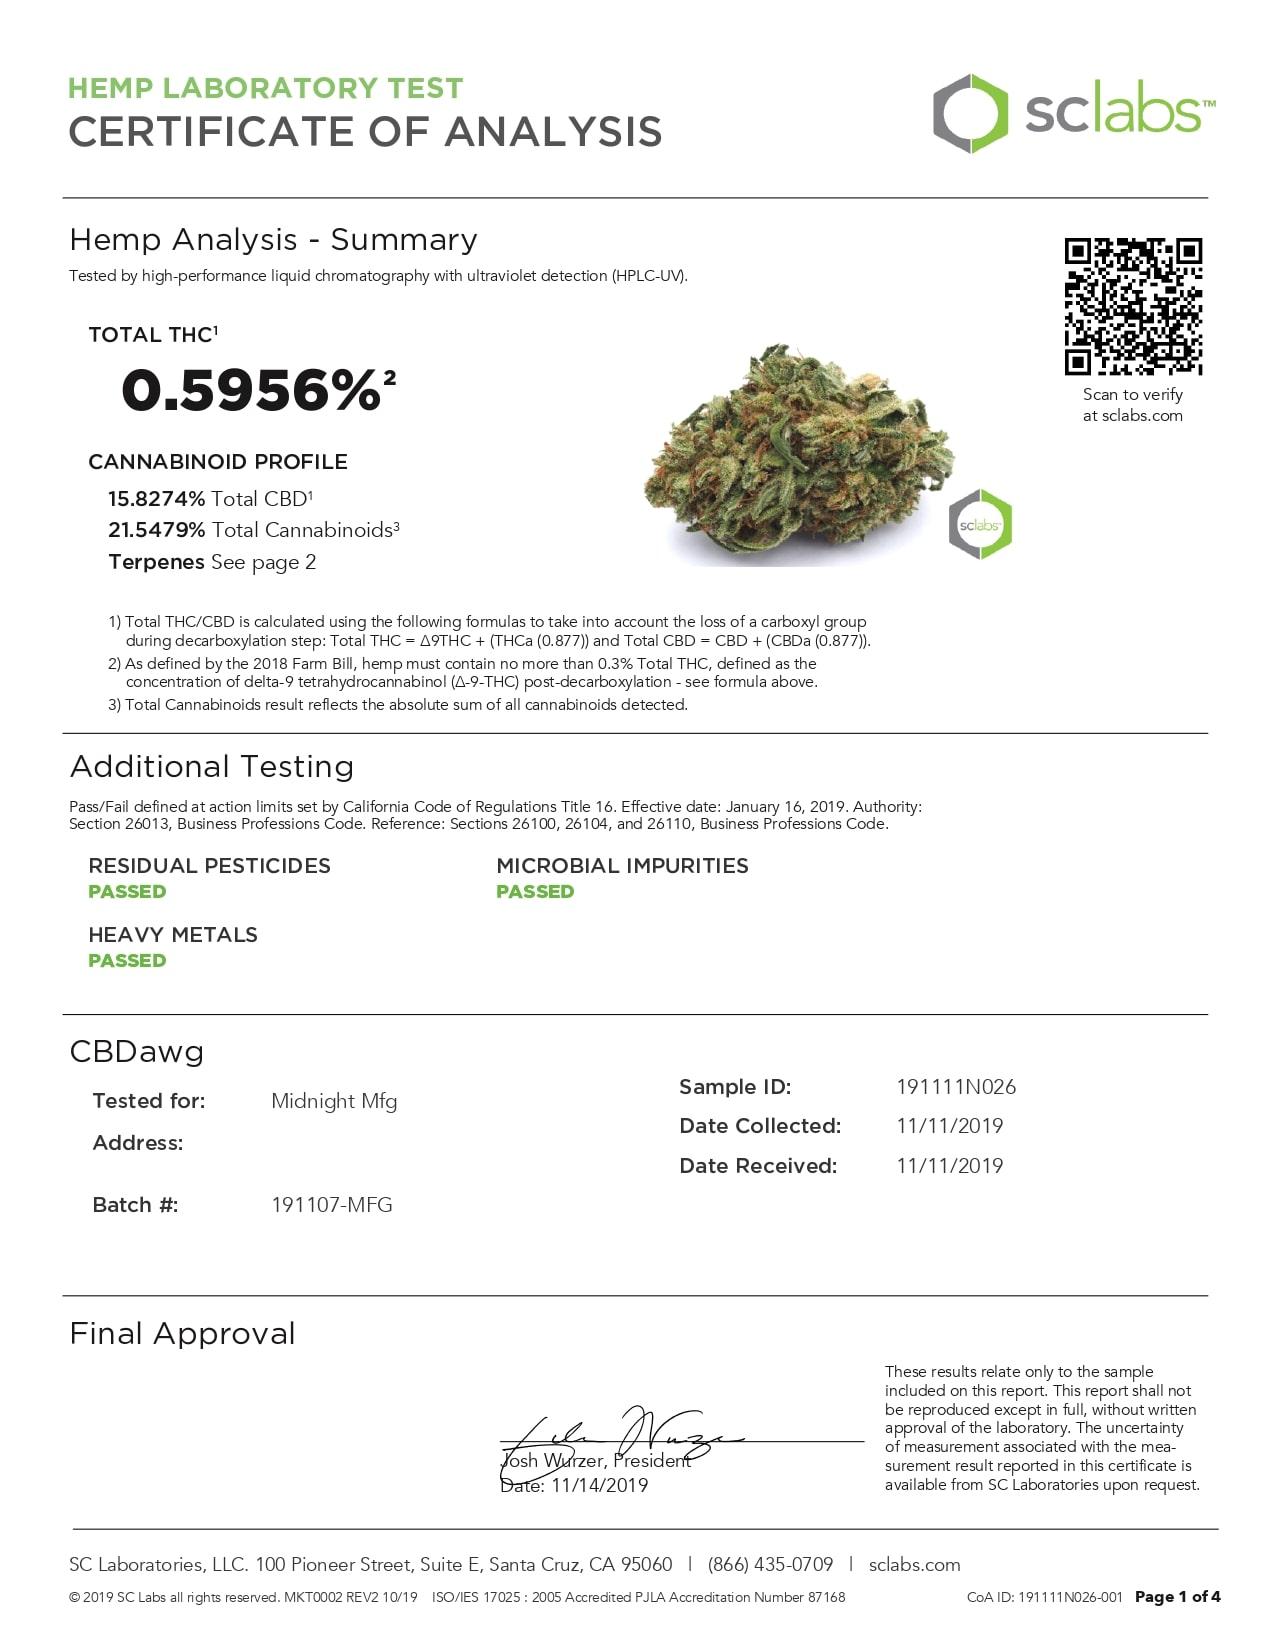 CANNA RIVER CBD CBDAWG Lab Report Hemp Flower